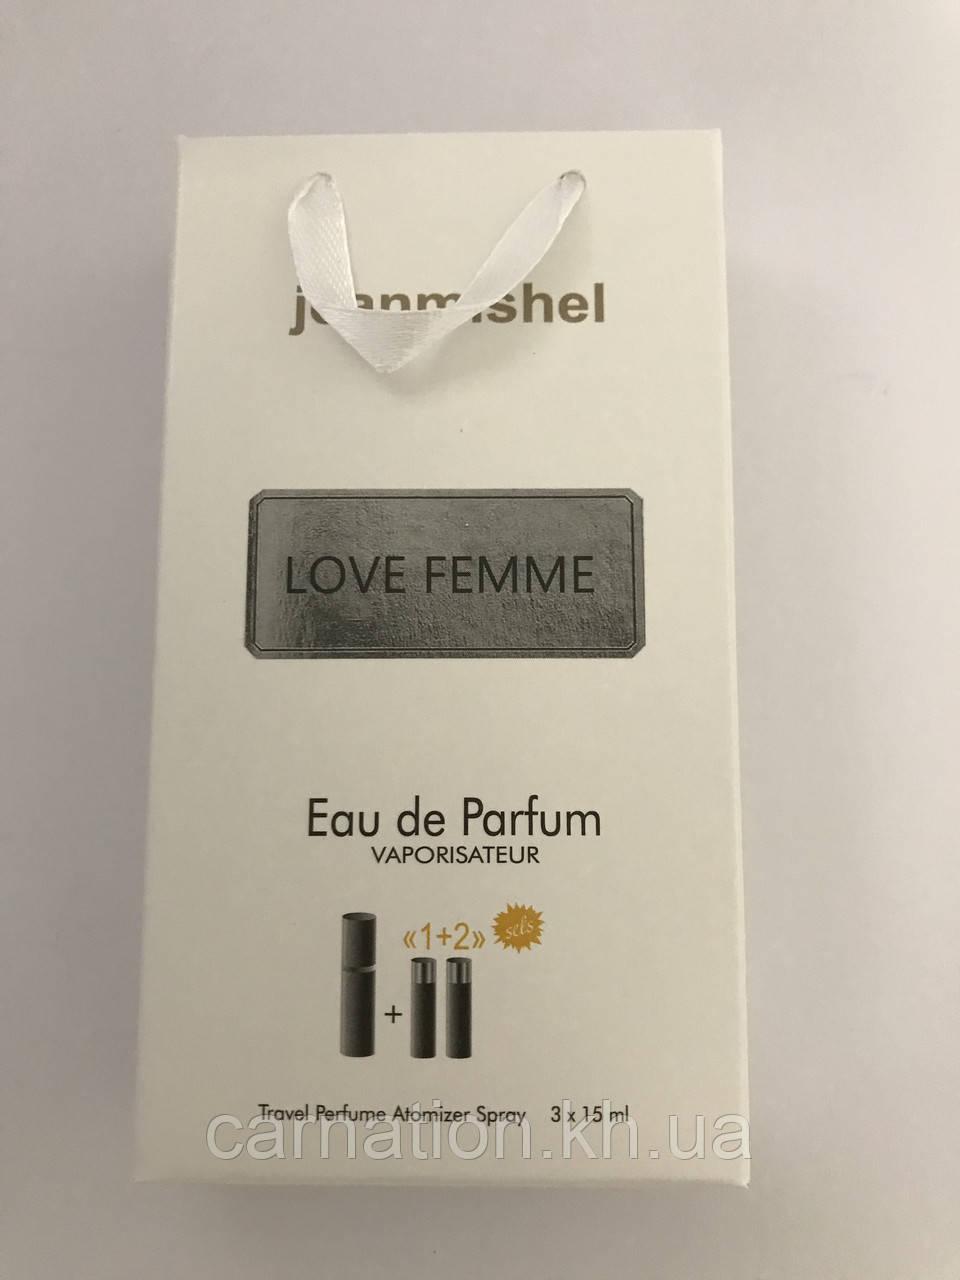 Подарочный набор LoveFemme Jeanmishel 3*15 мл